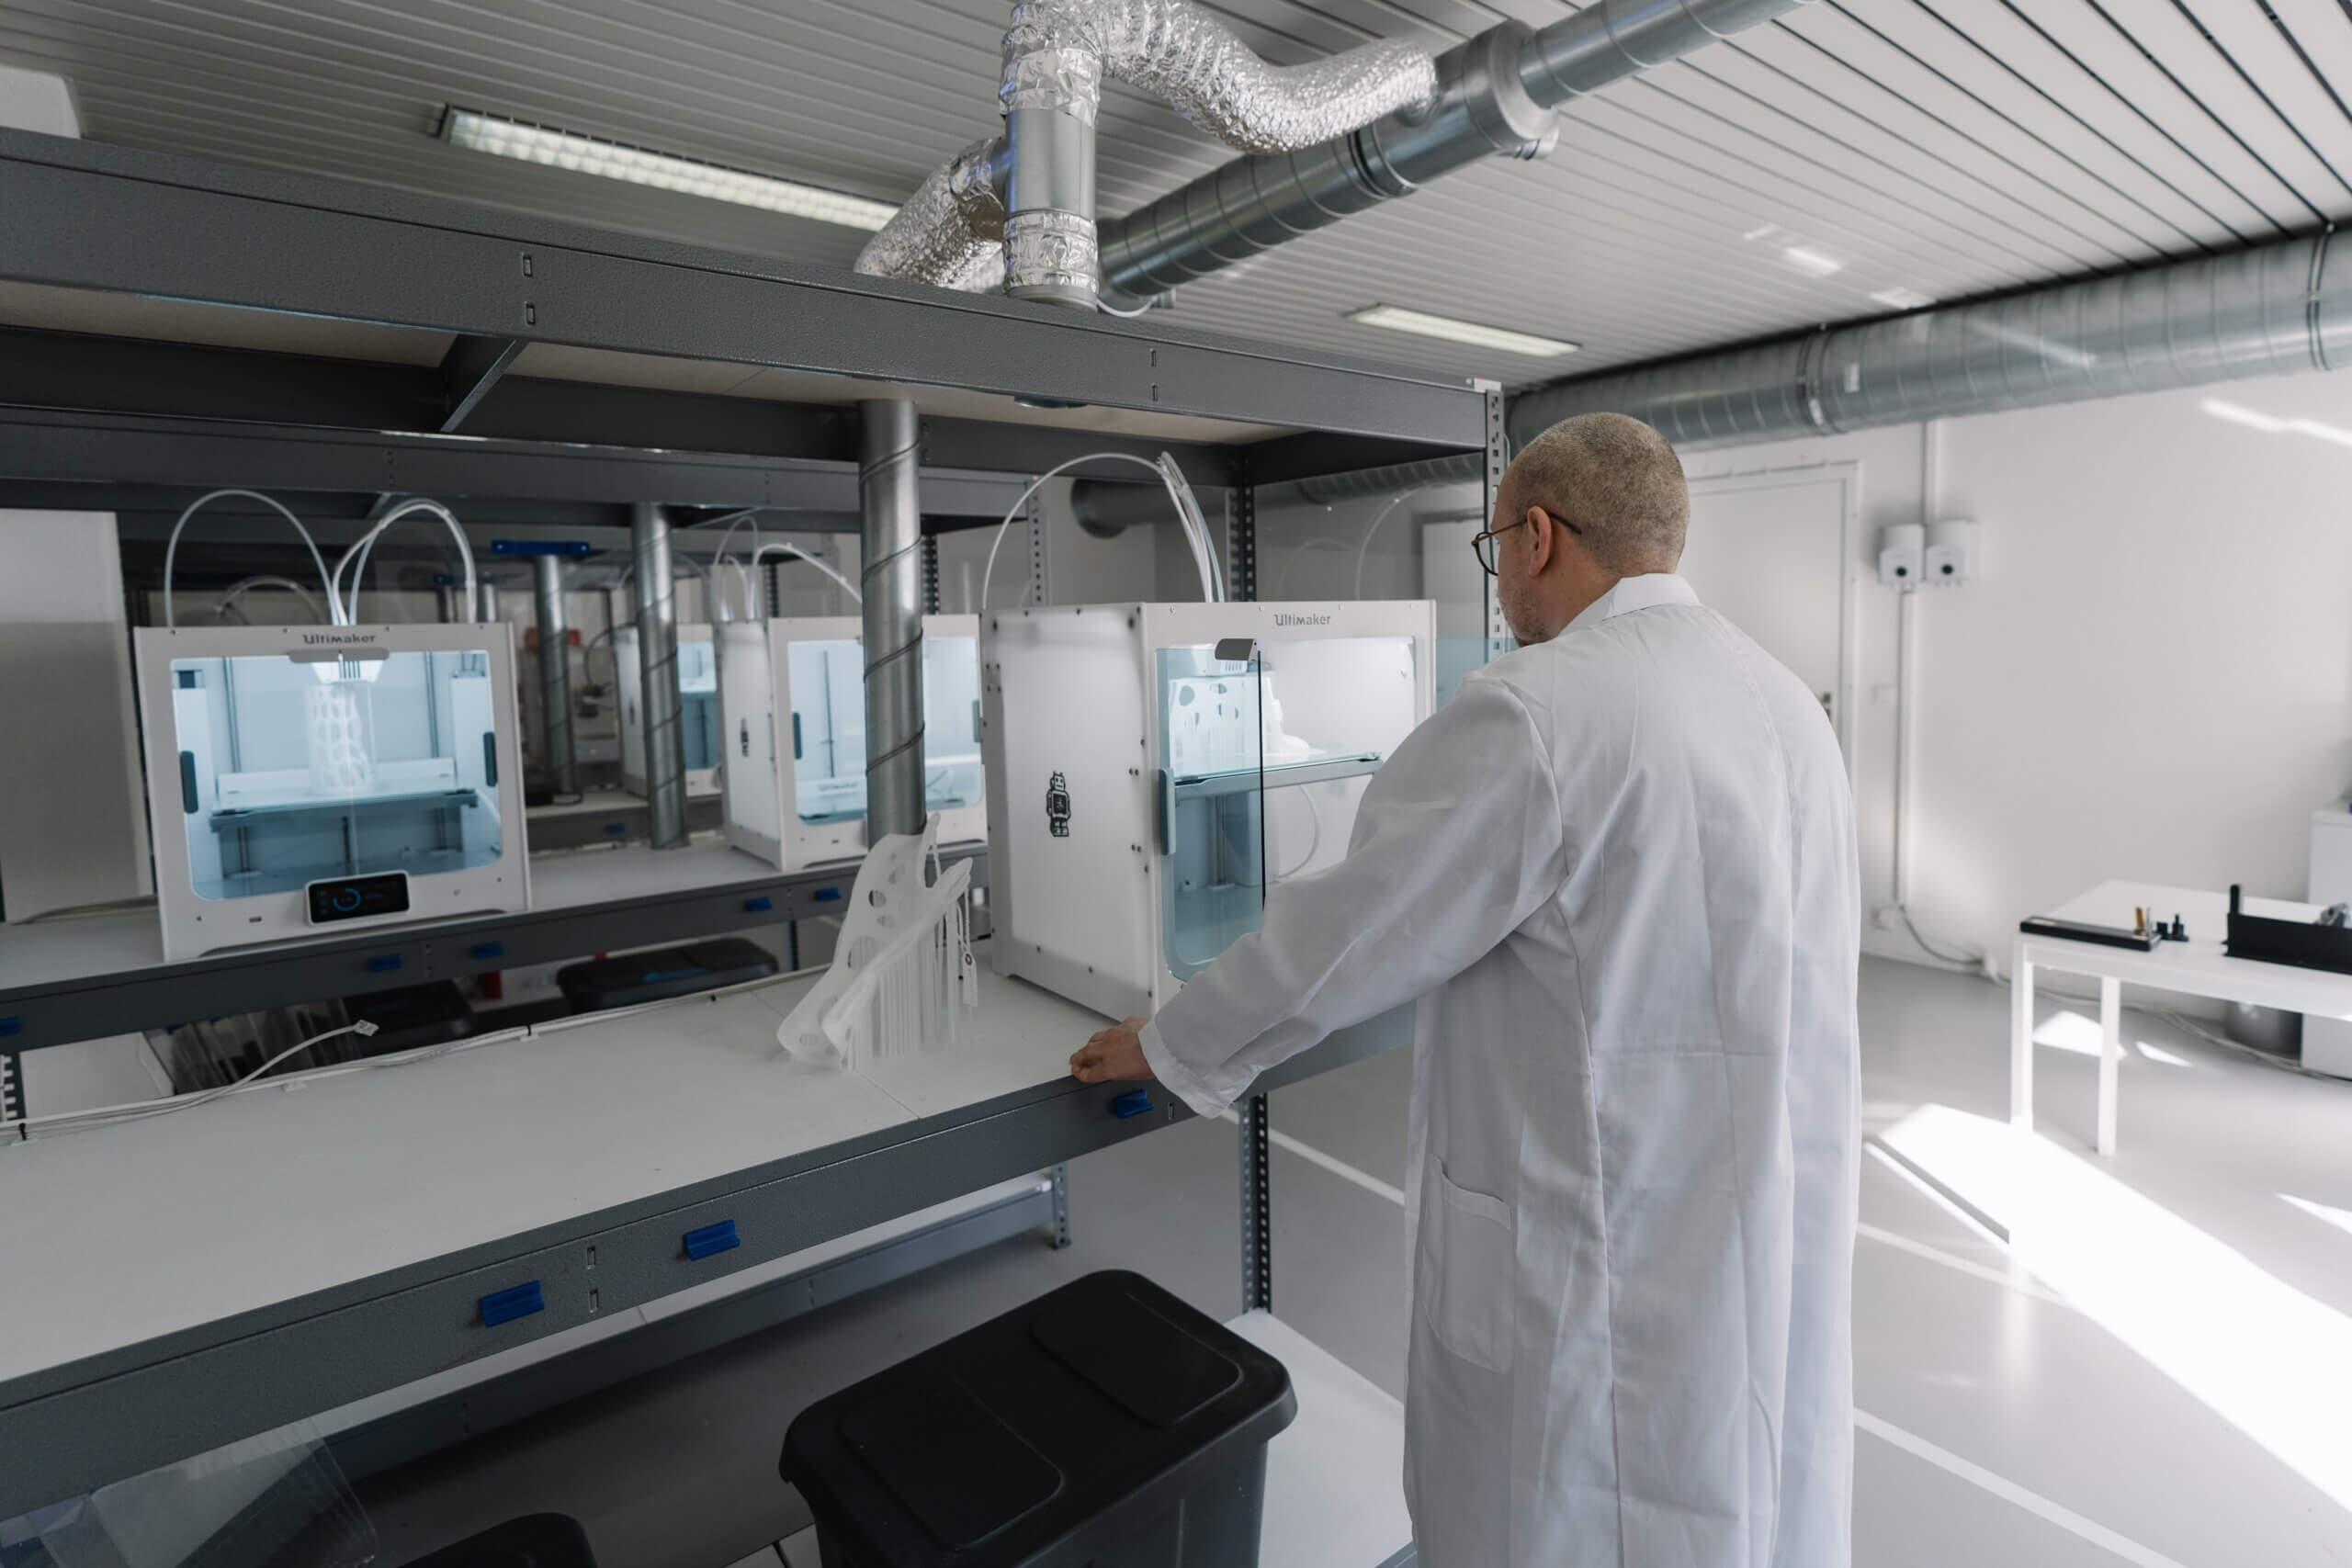 Medical technology trends during Coronavirus pandemic